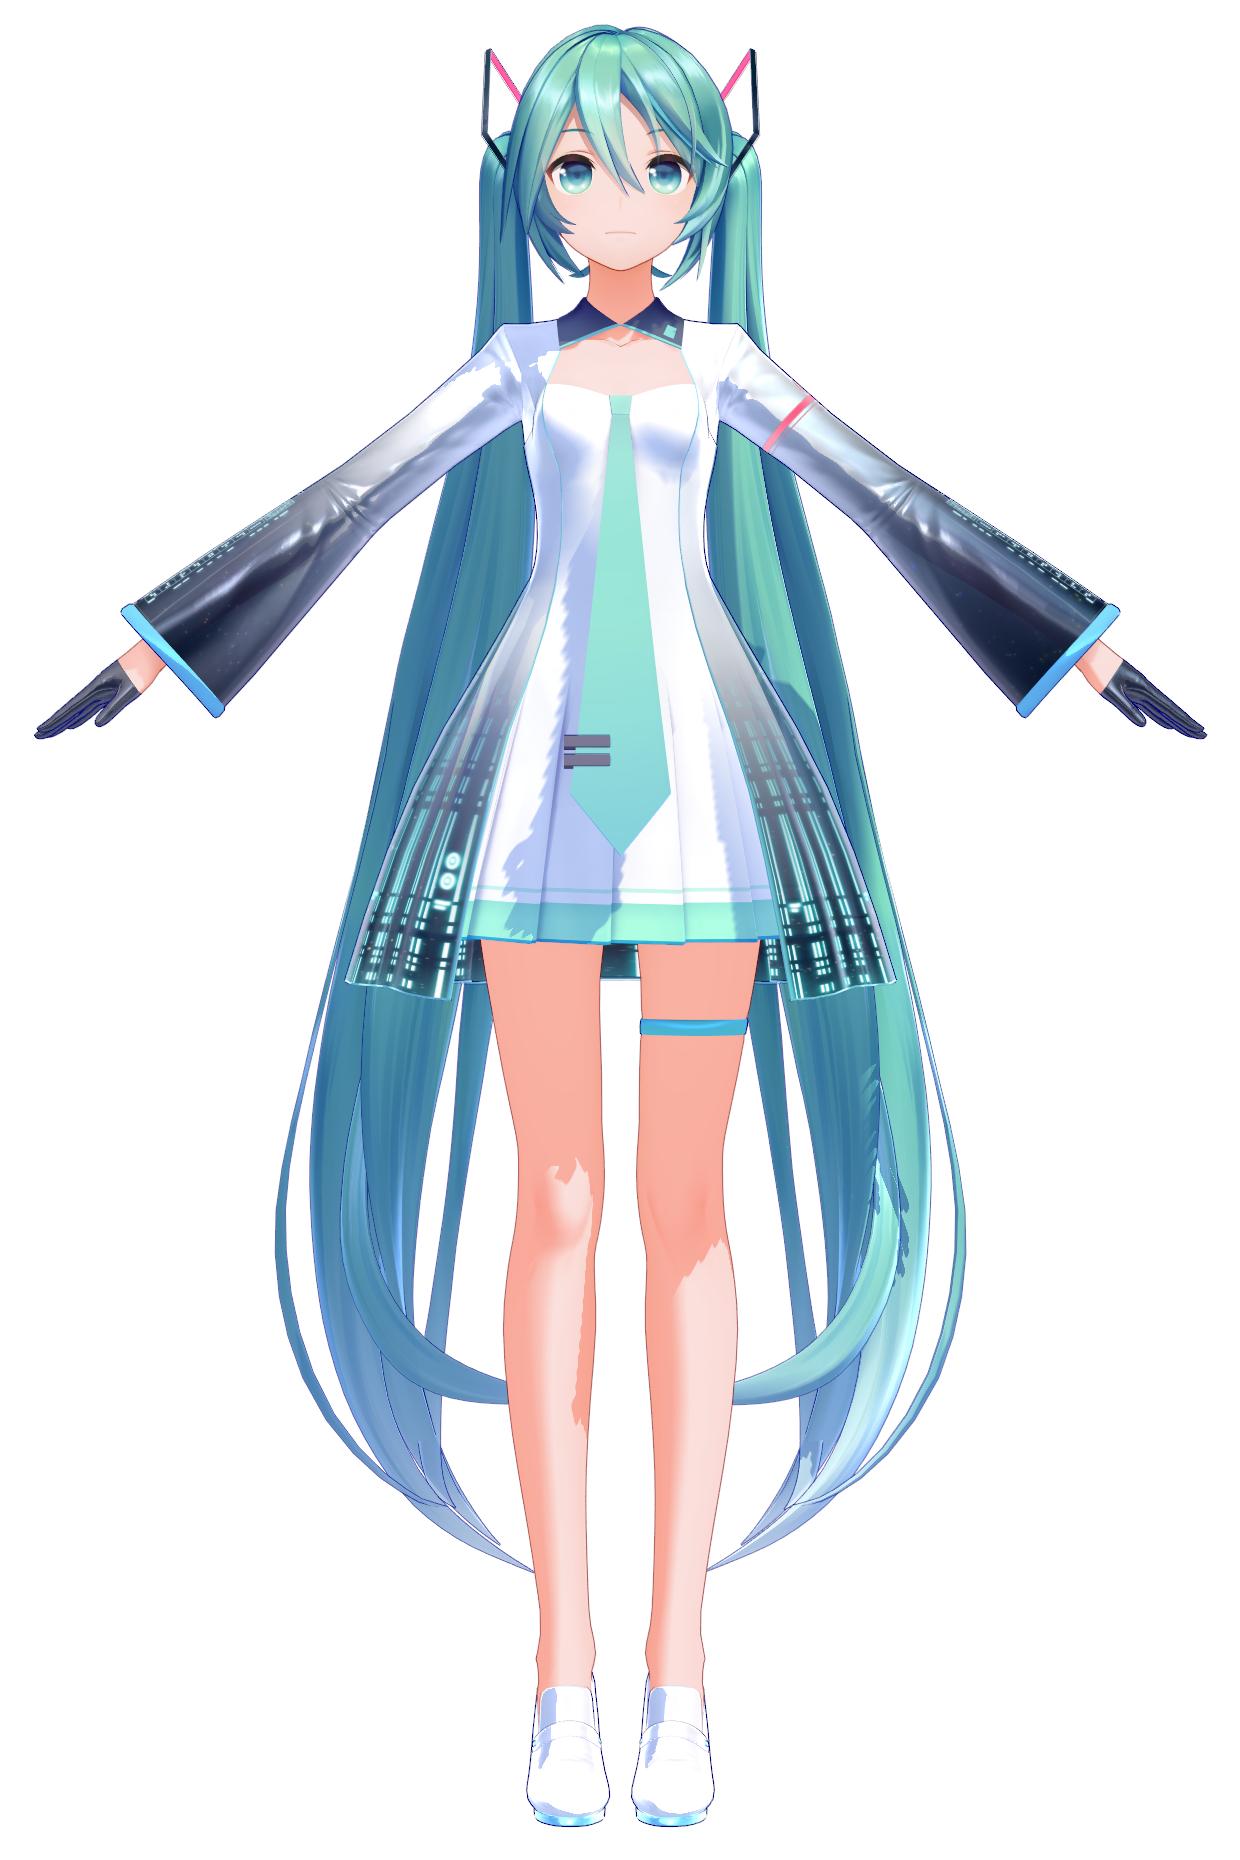 Miku Hatsune 10th anniversary Model (YYB) | MikuMikuDance